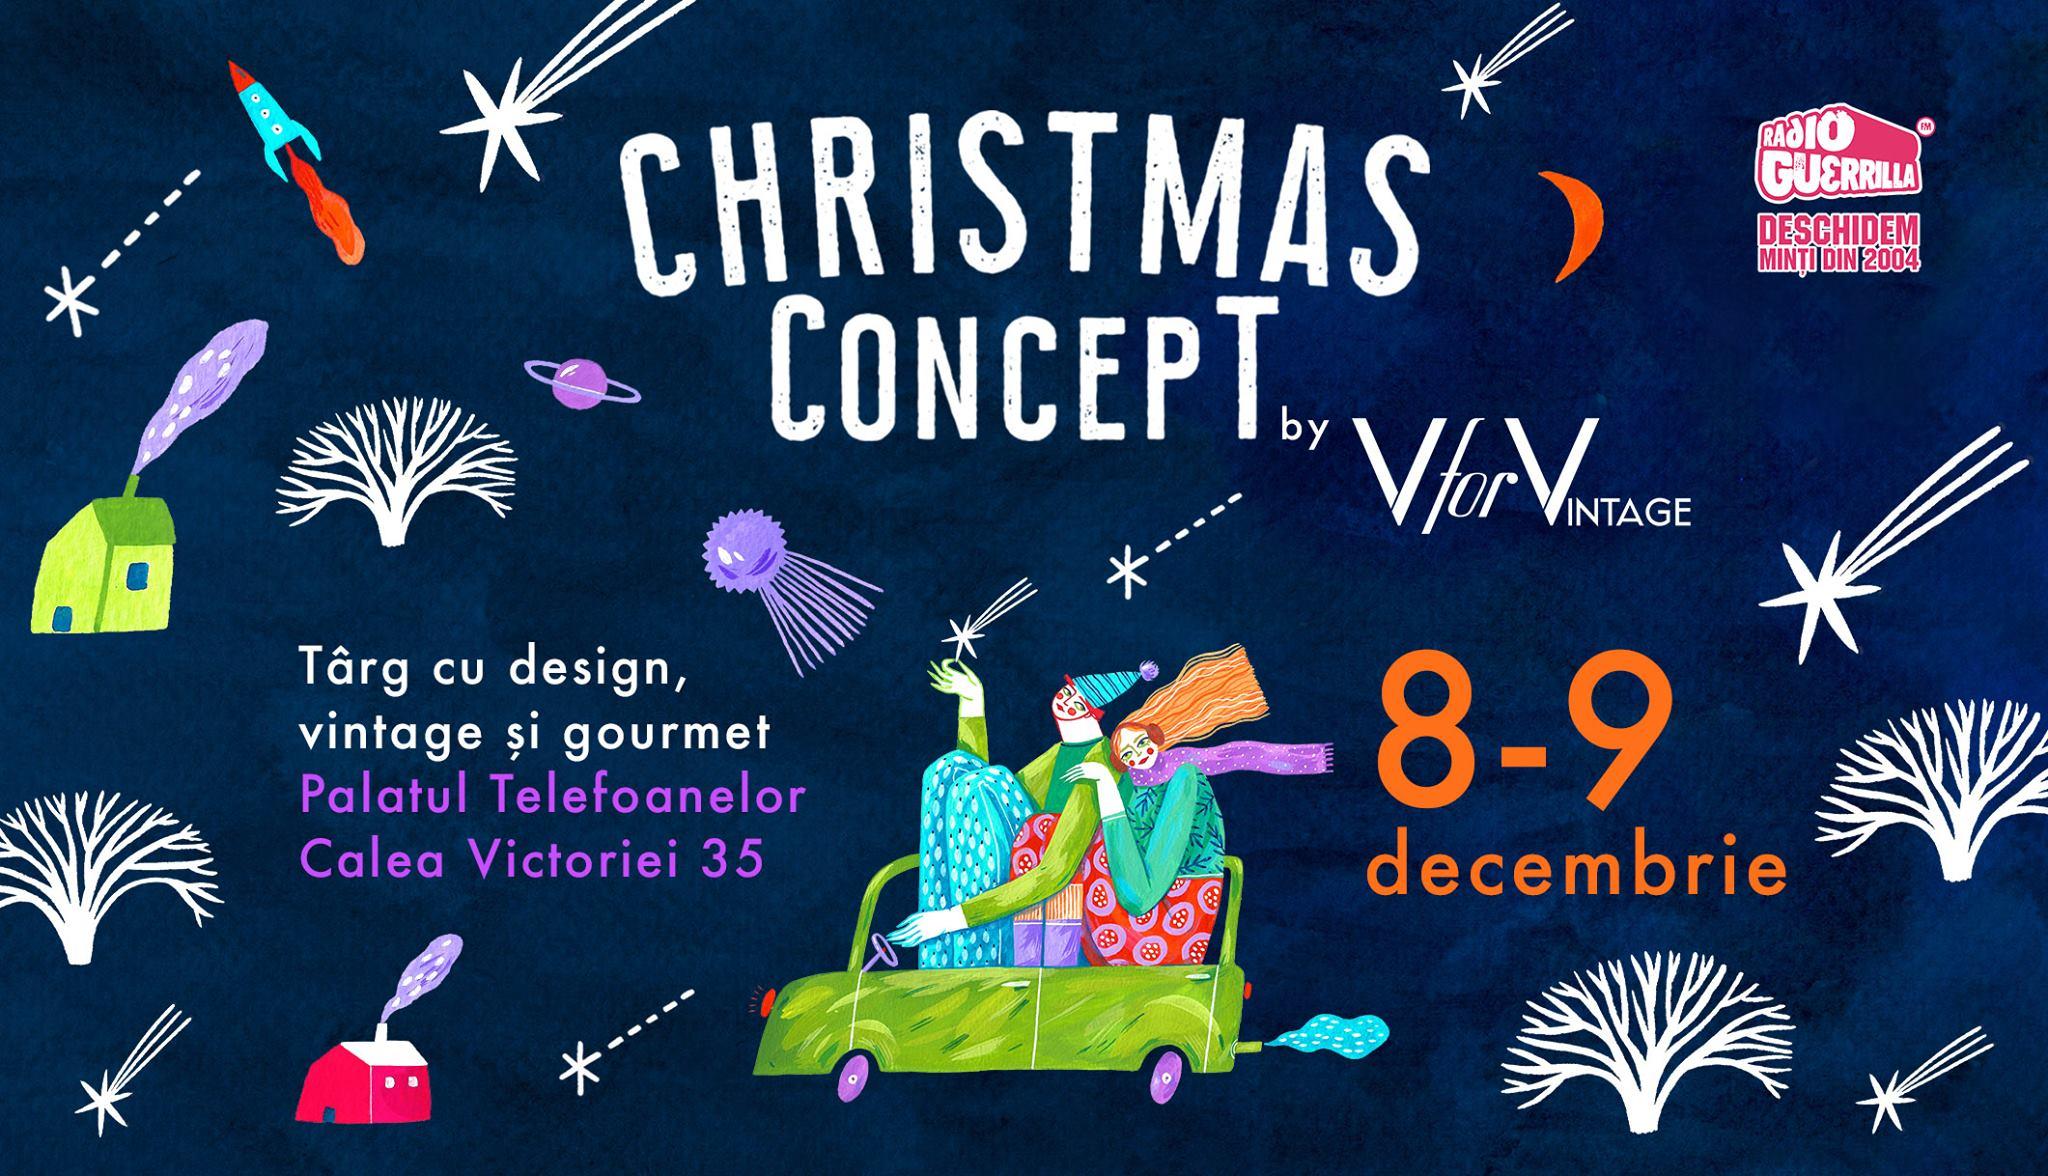 Christmas Concept - targ cu design, vintage si gourmet